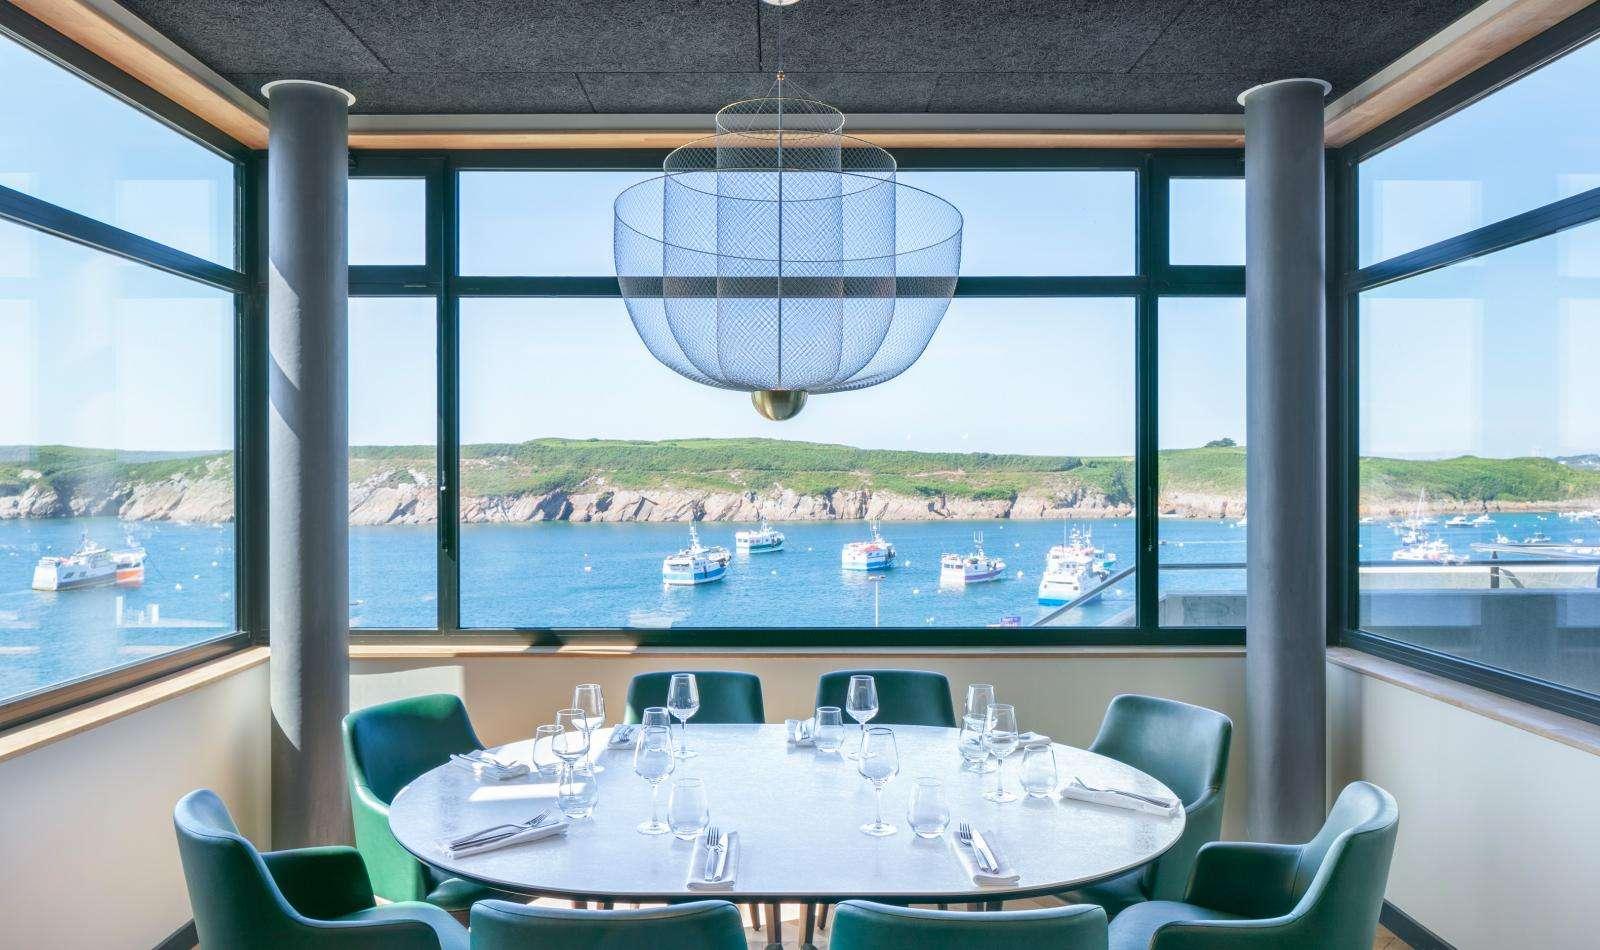 hotel-sainte-barbe-restaurant-1.jpg